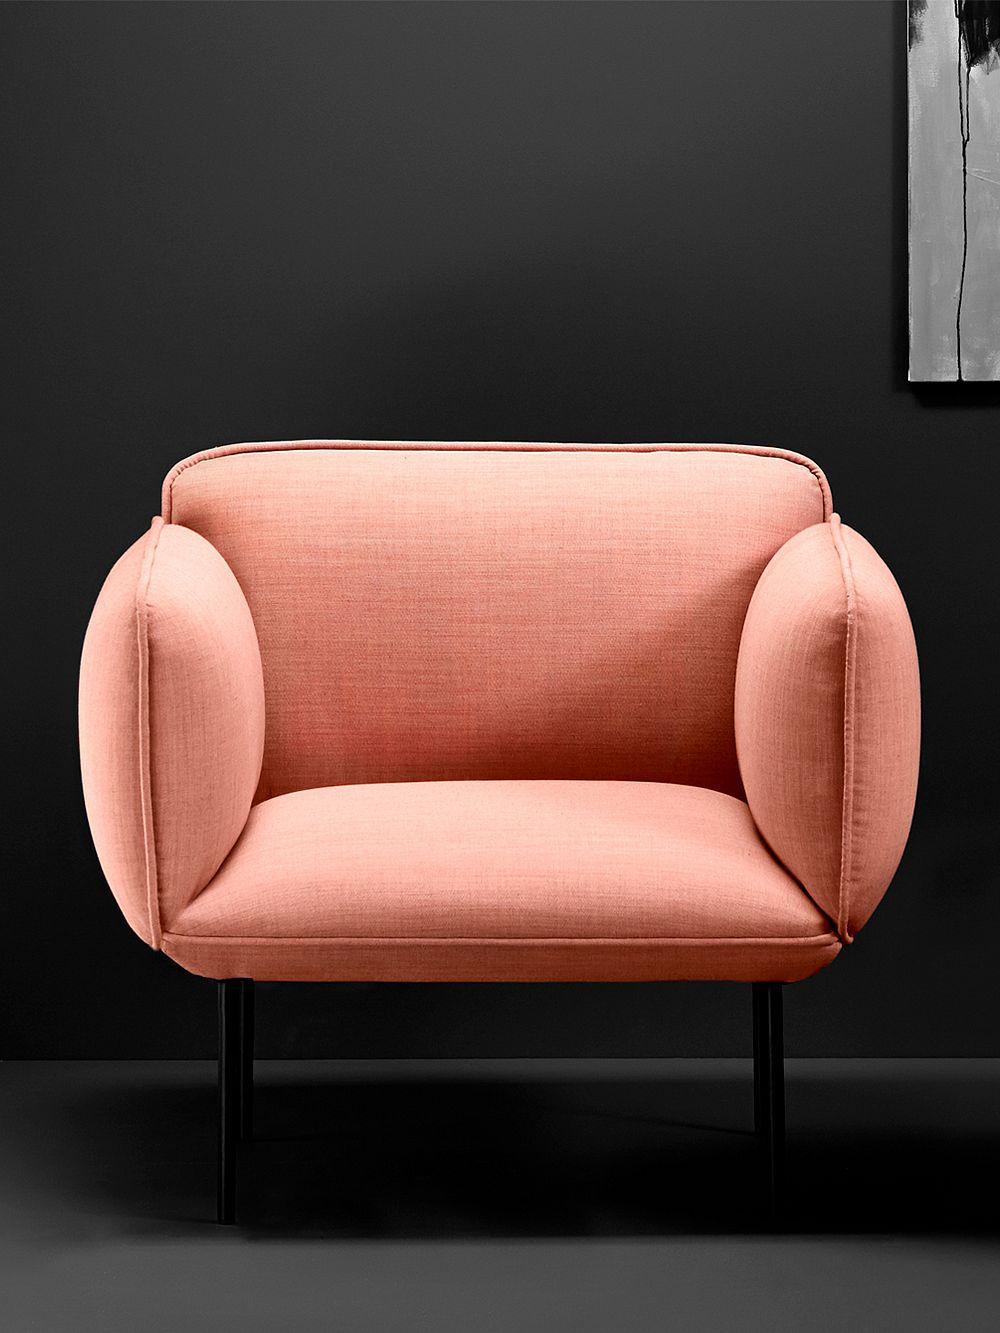 Woud Nakki lounge chair